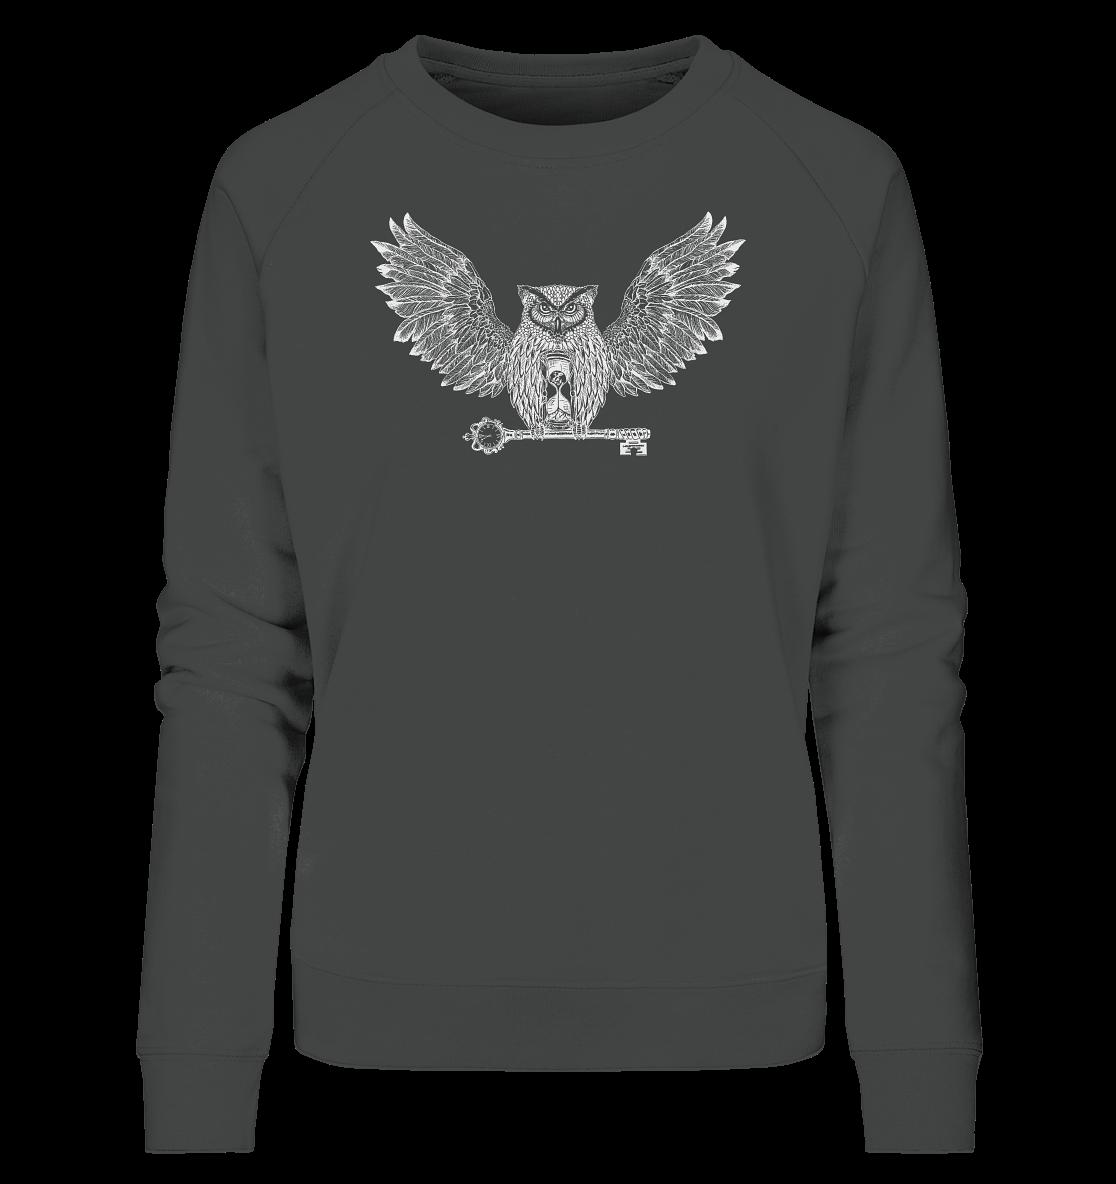 front-ladies-organic-sweatshirt-444545-1116x-4.png